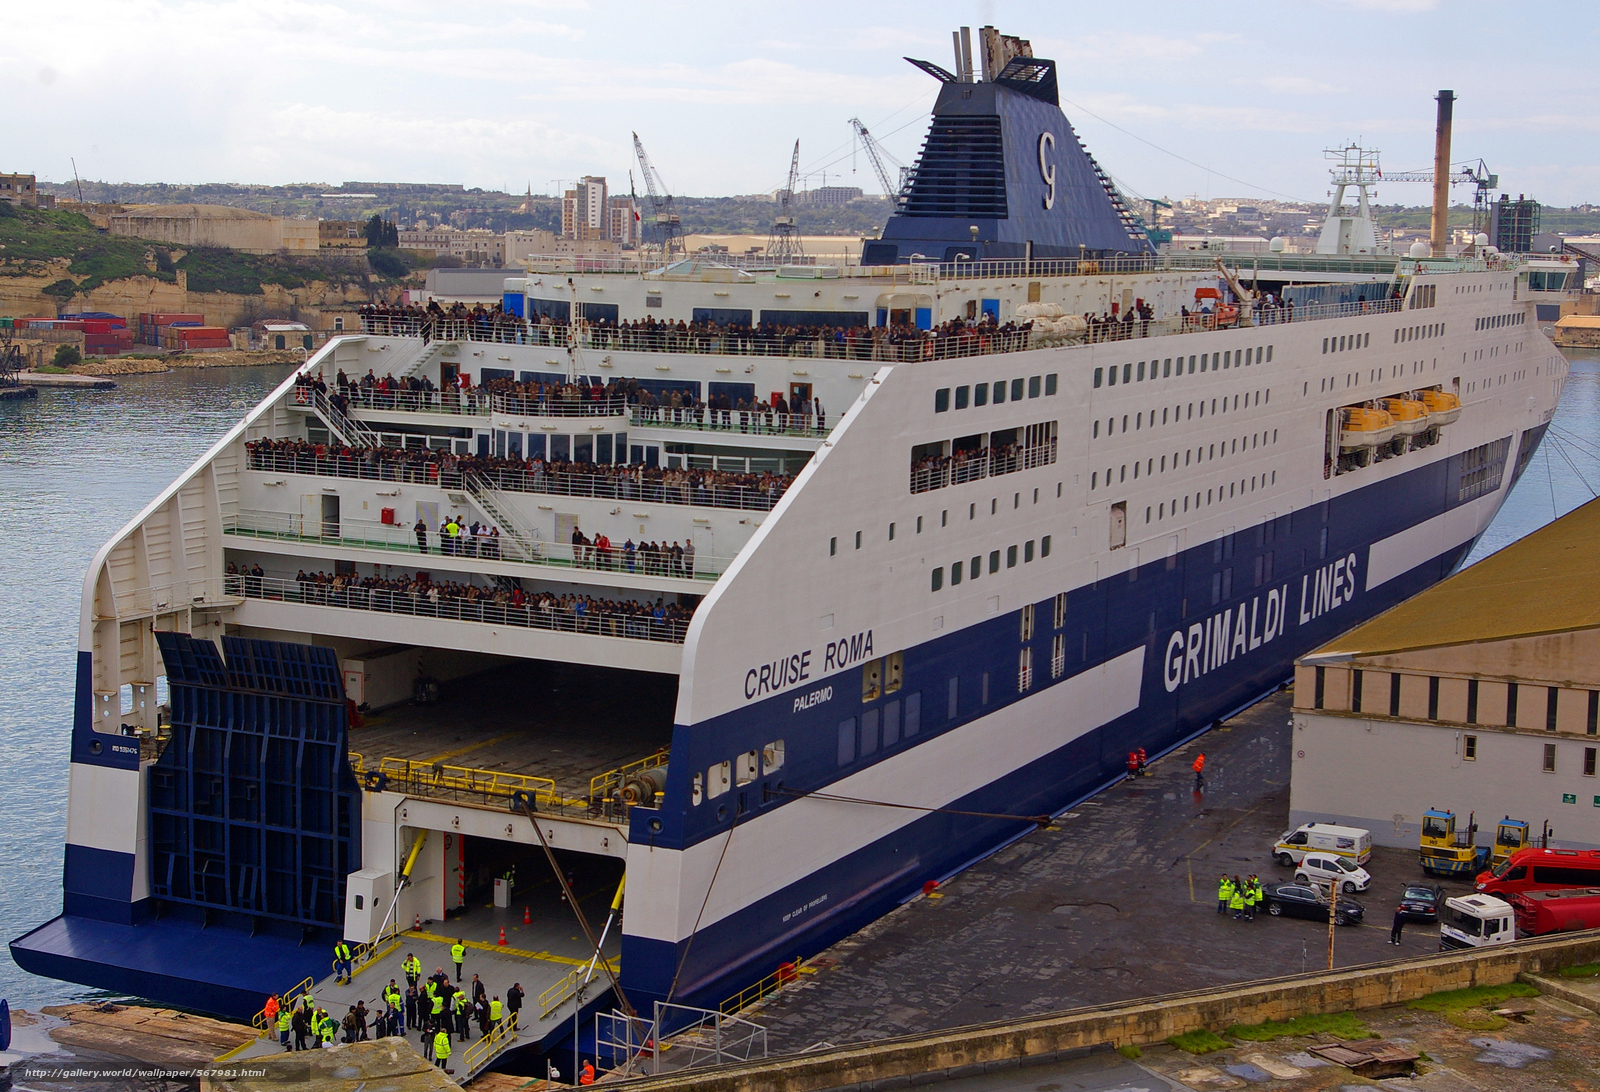 Grimaldi Lines, круиз на корабле Рома, мальта